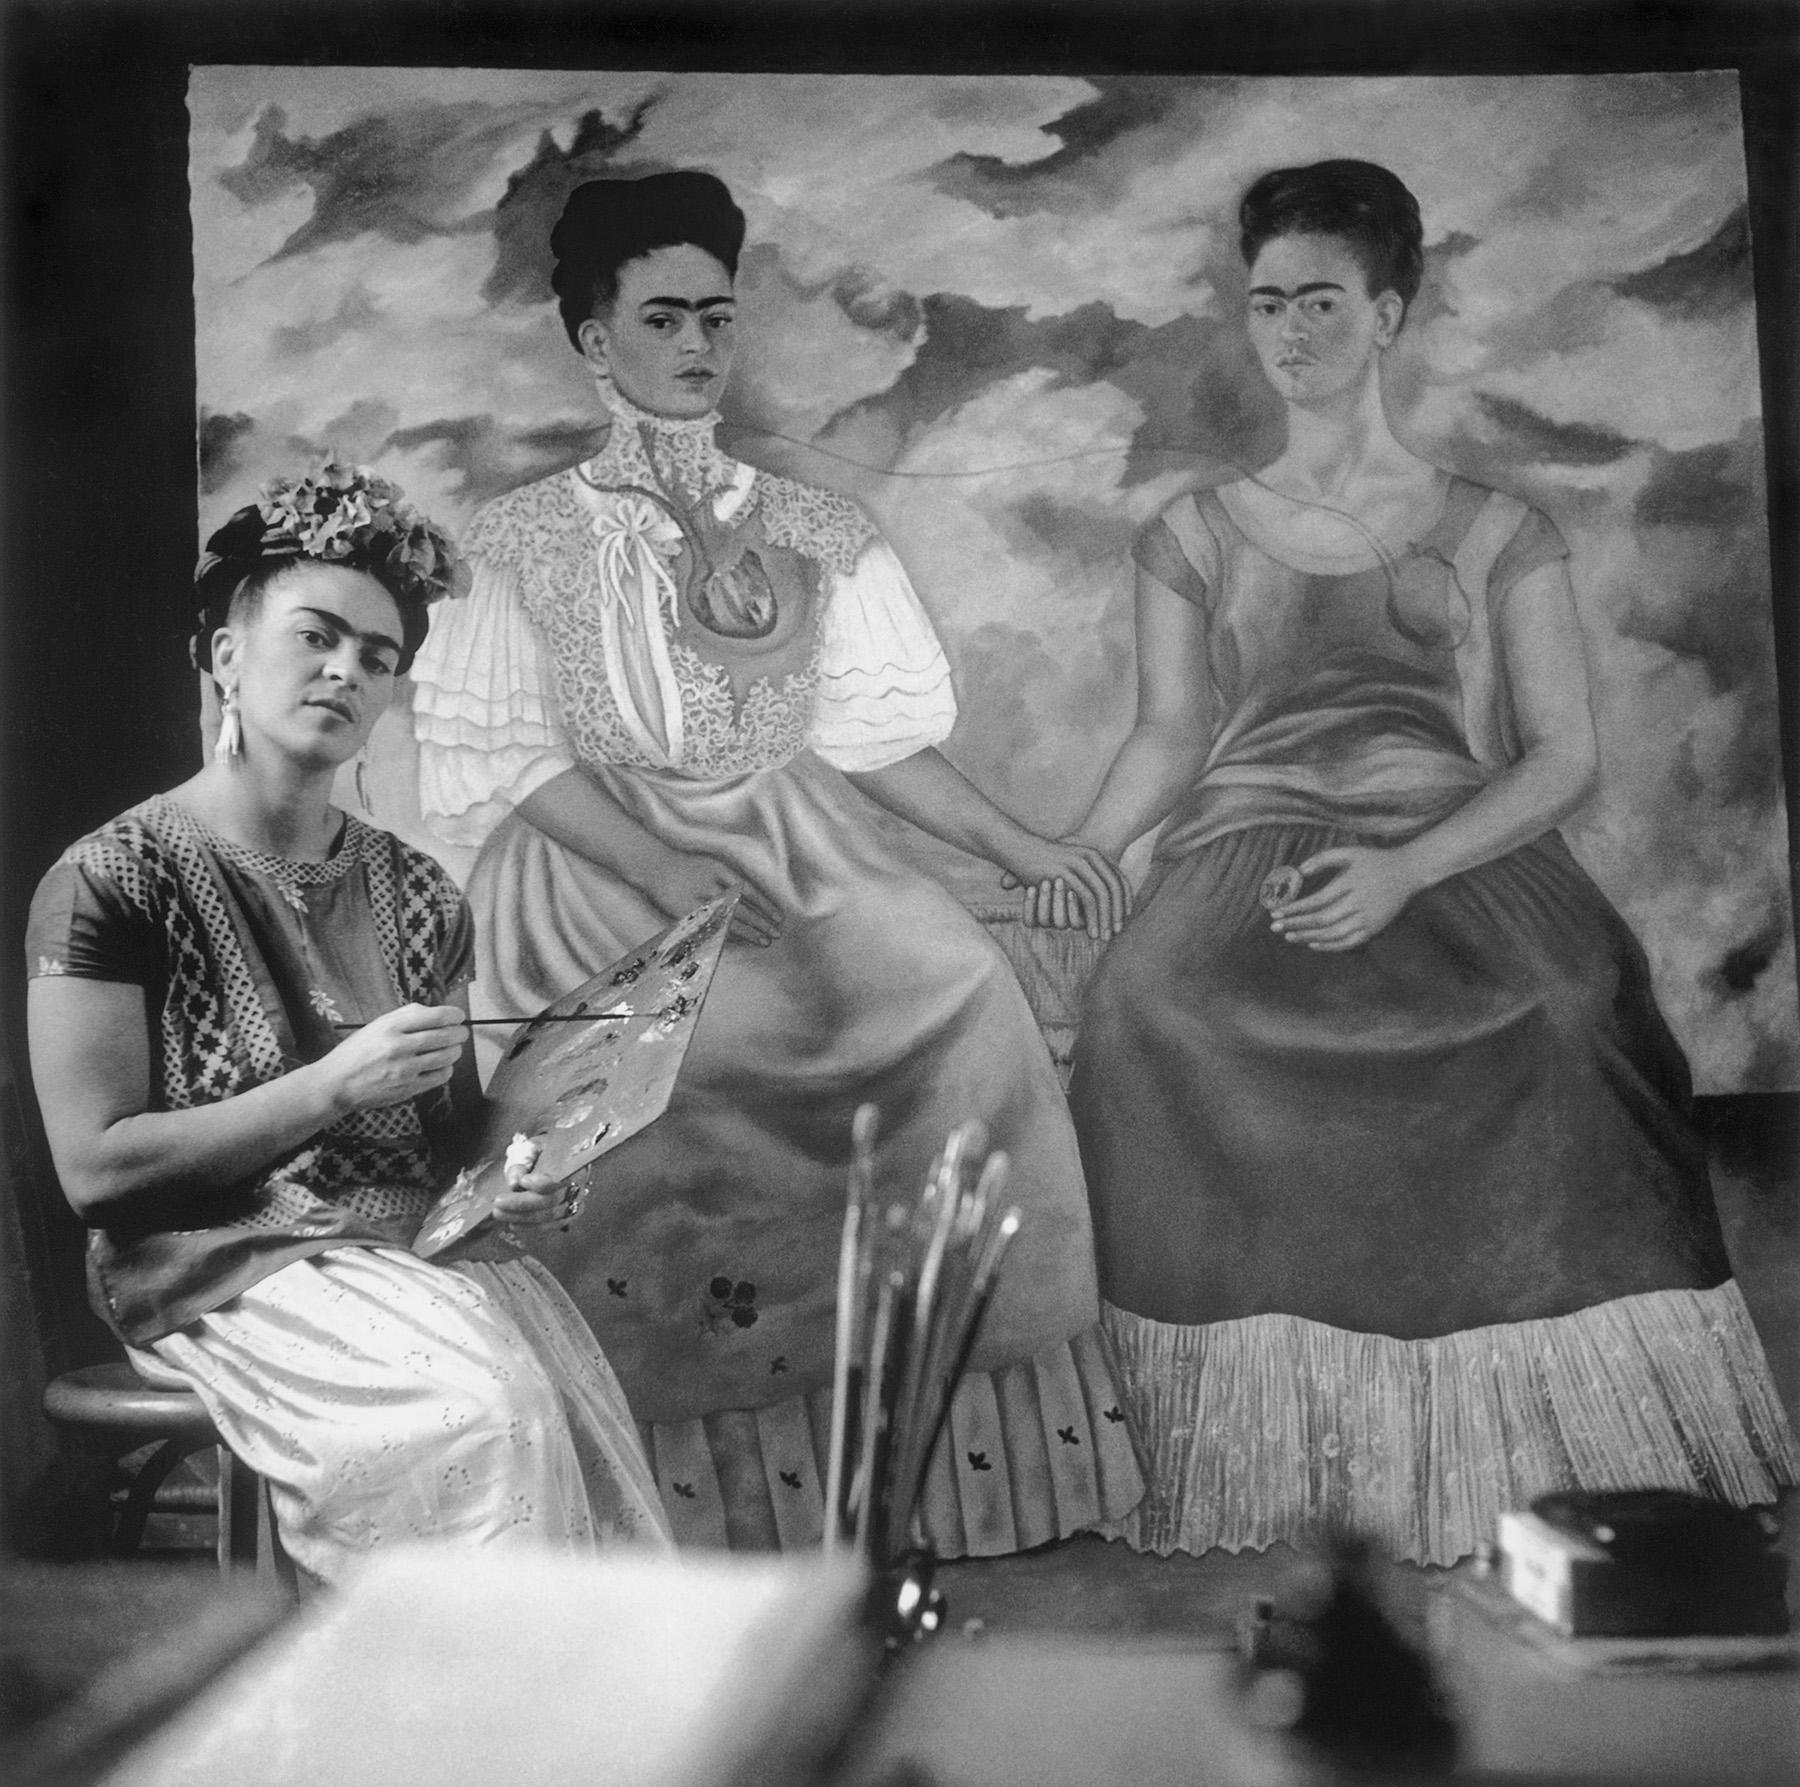 Nickolas Muray (1892-1965)  Frida painting 'The Two Fridas', Coyoacán, 1939 gelatin silver print ©Nickolas Muray Photo Archives courtesy of  Etherton Gallery